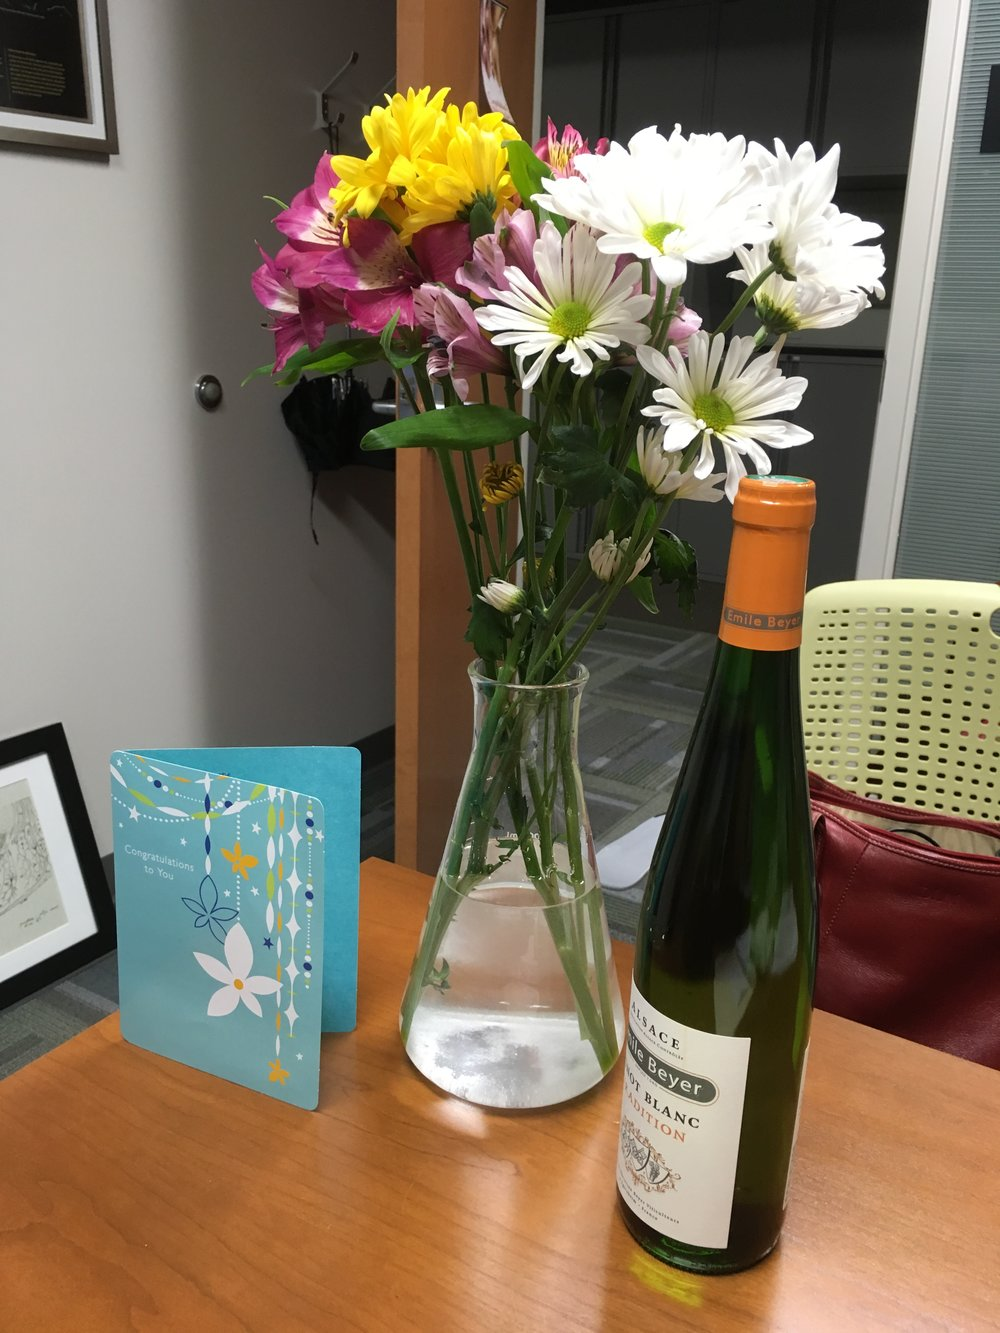 Sweet rewards - lab gift for Sloan Award